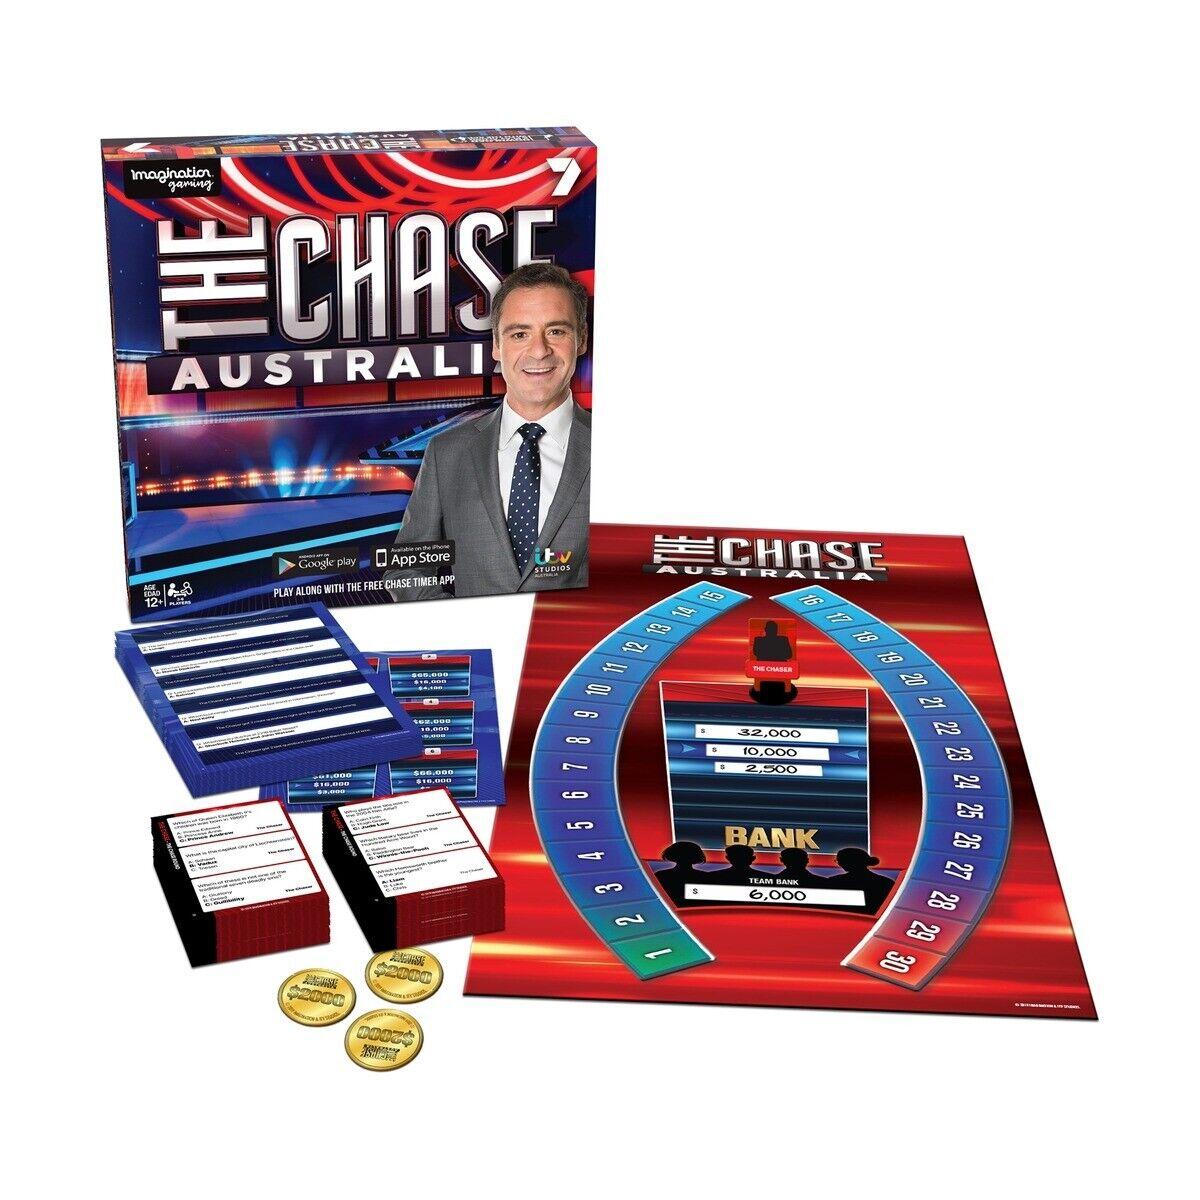 The Chase Australia Family Kids Indoor Fun Board Game Activity Trivia Ima01207 669165012077 Ebay